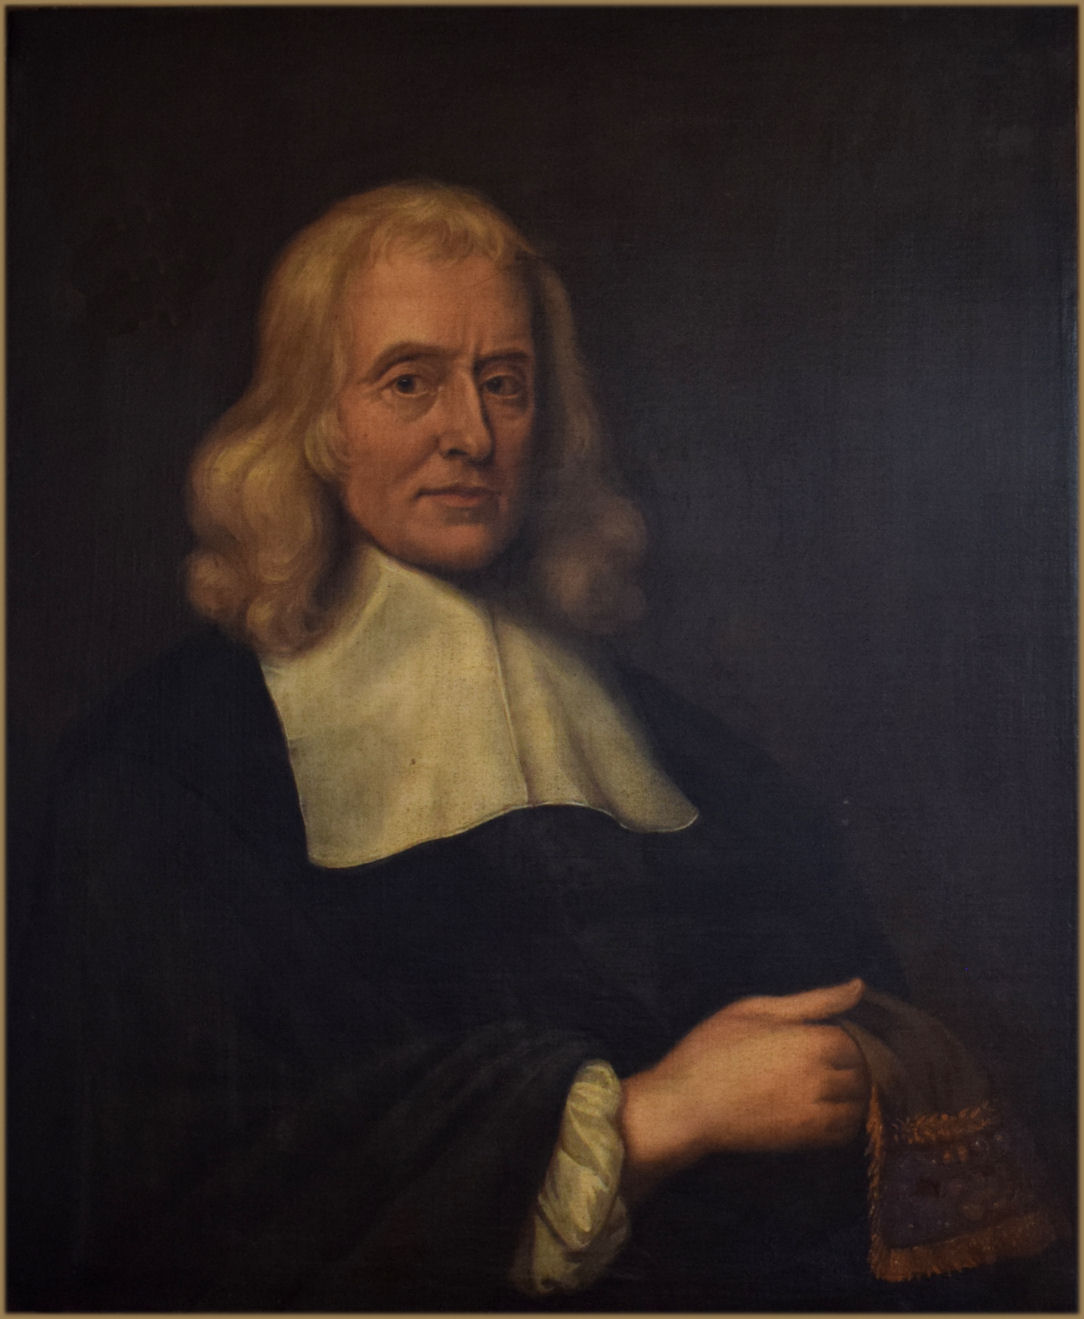 John Milton on his blindness